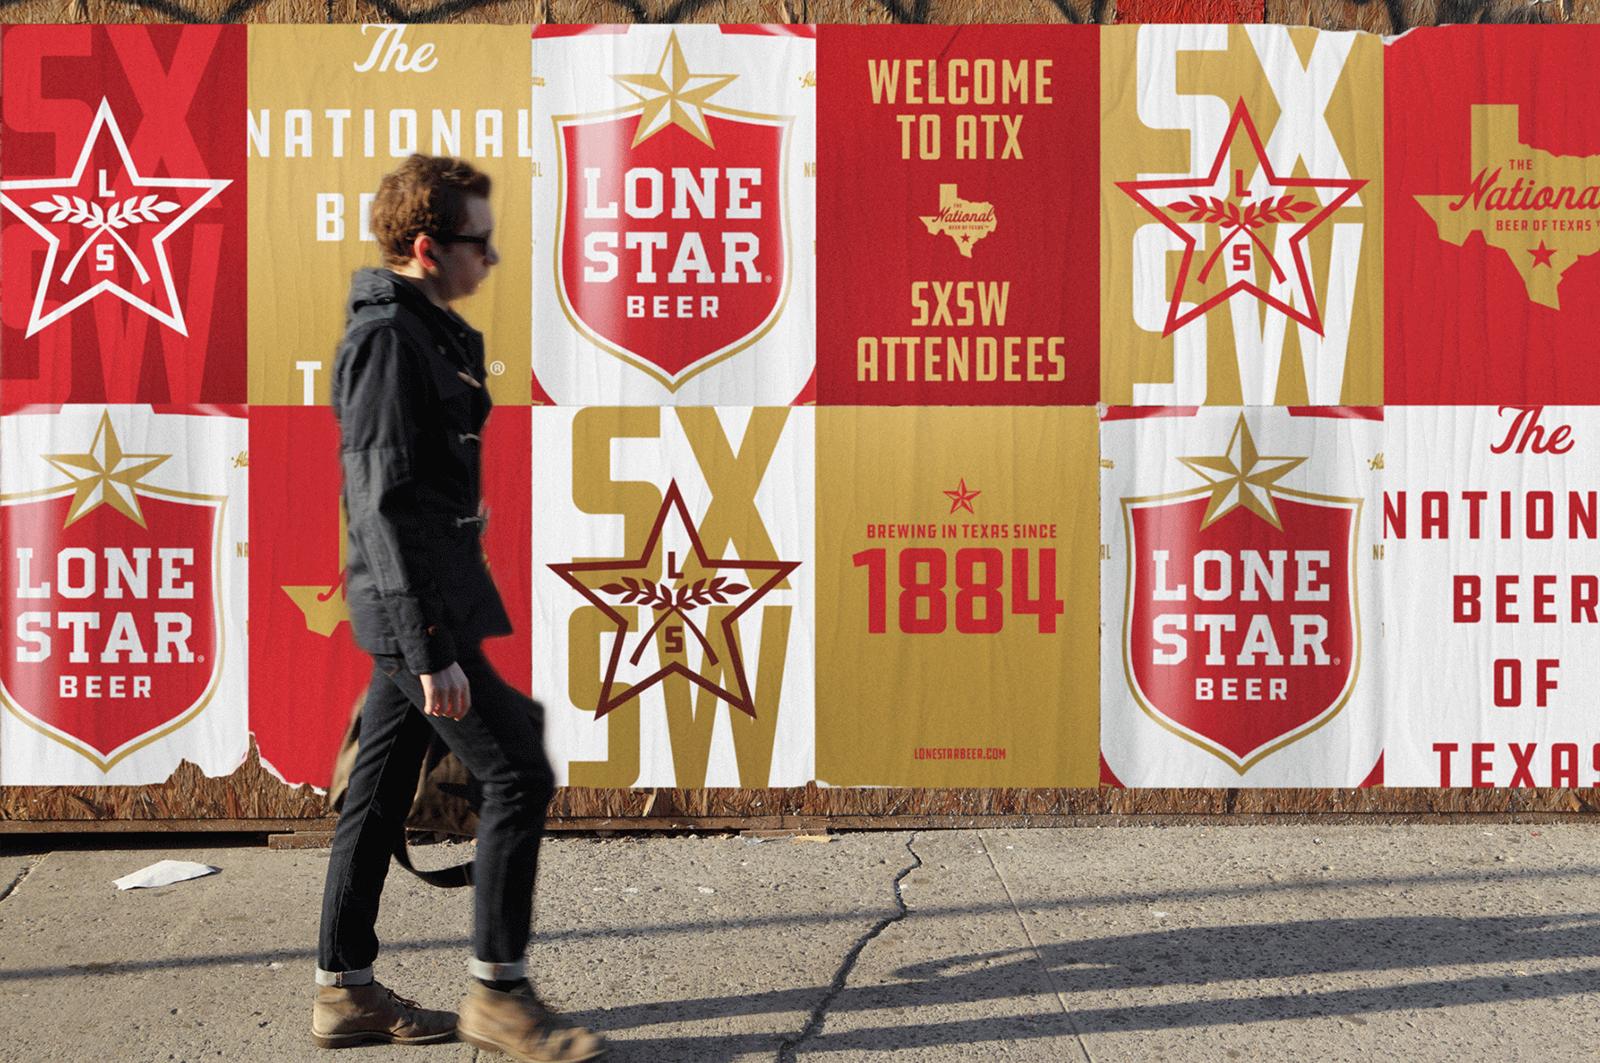 Lone Star孤星啤酒品牌更新全新的品牌VI视觉和包装设计-深圳VI设计11